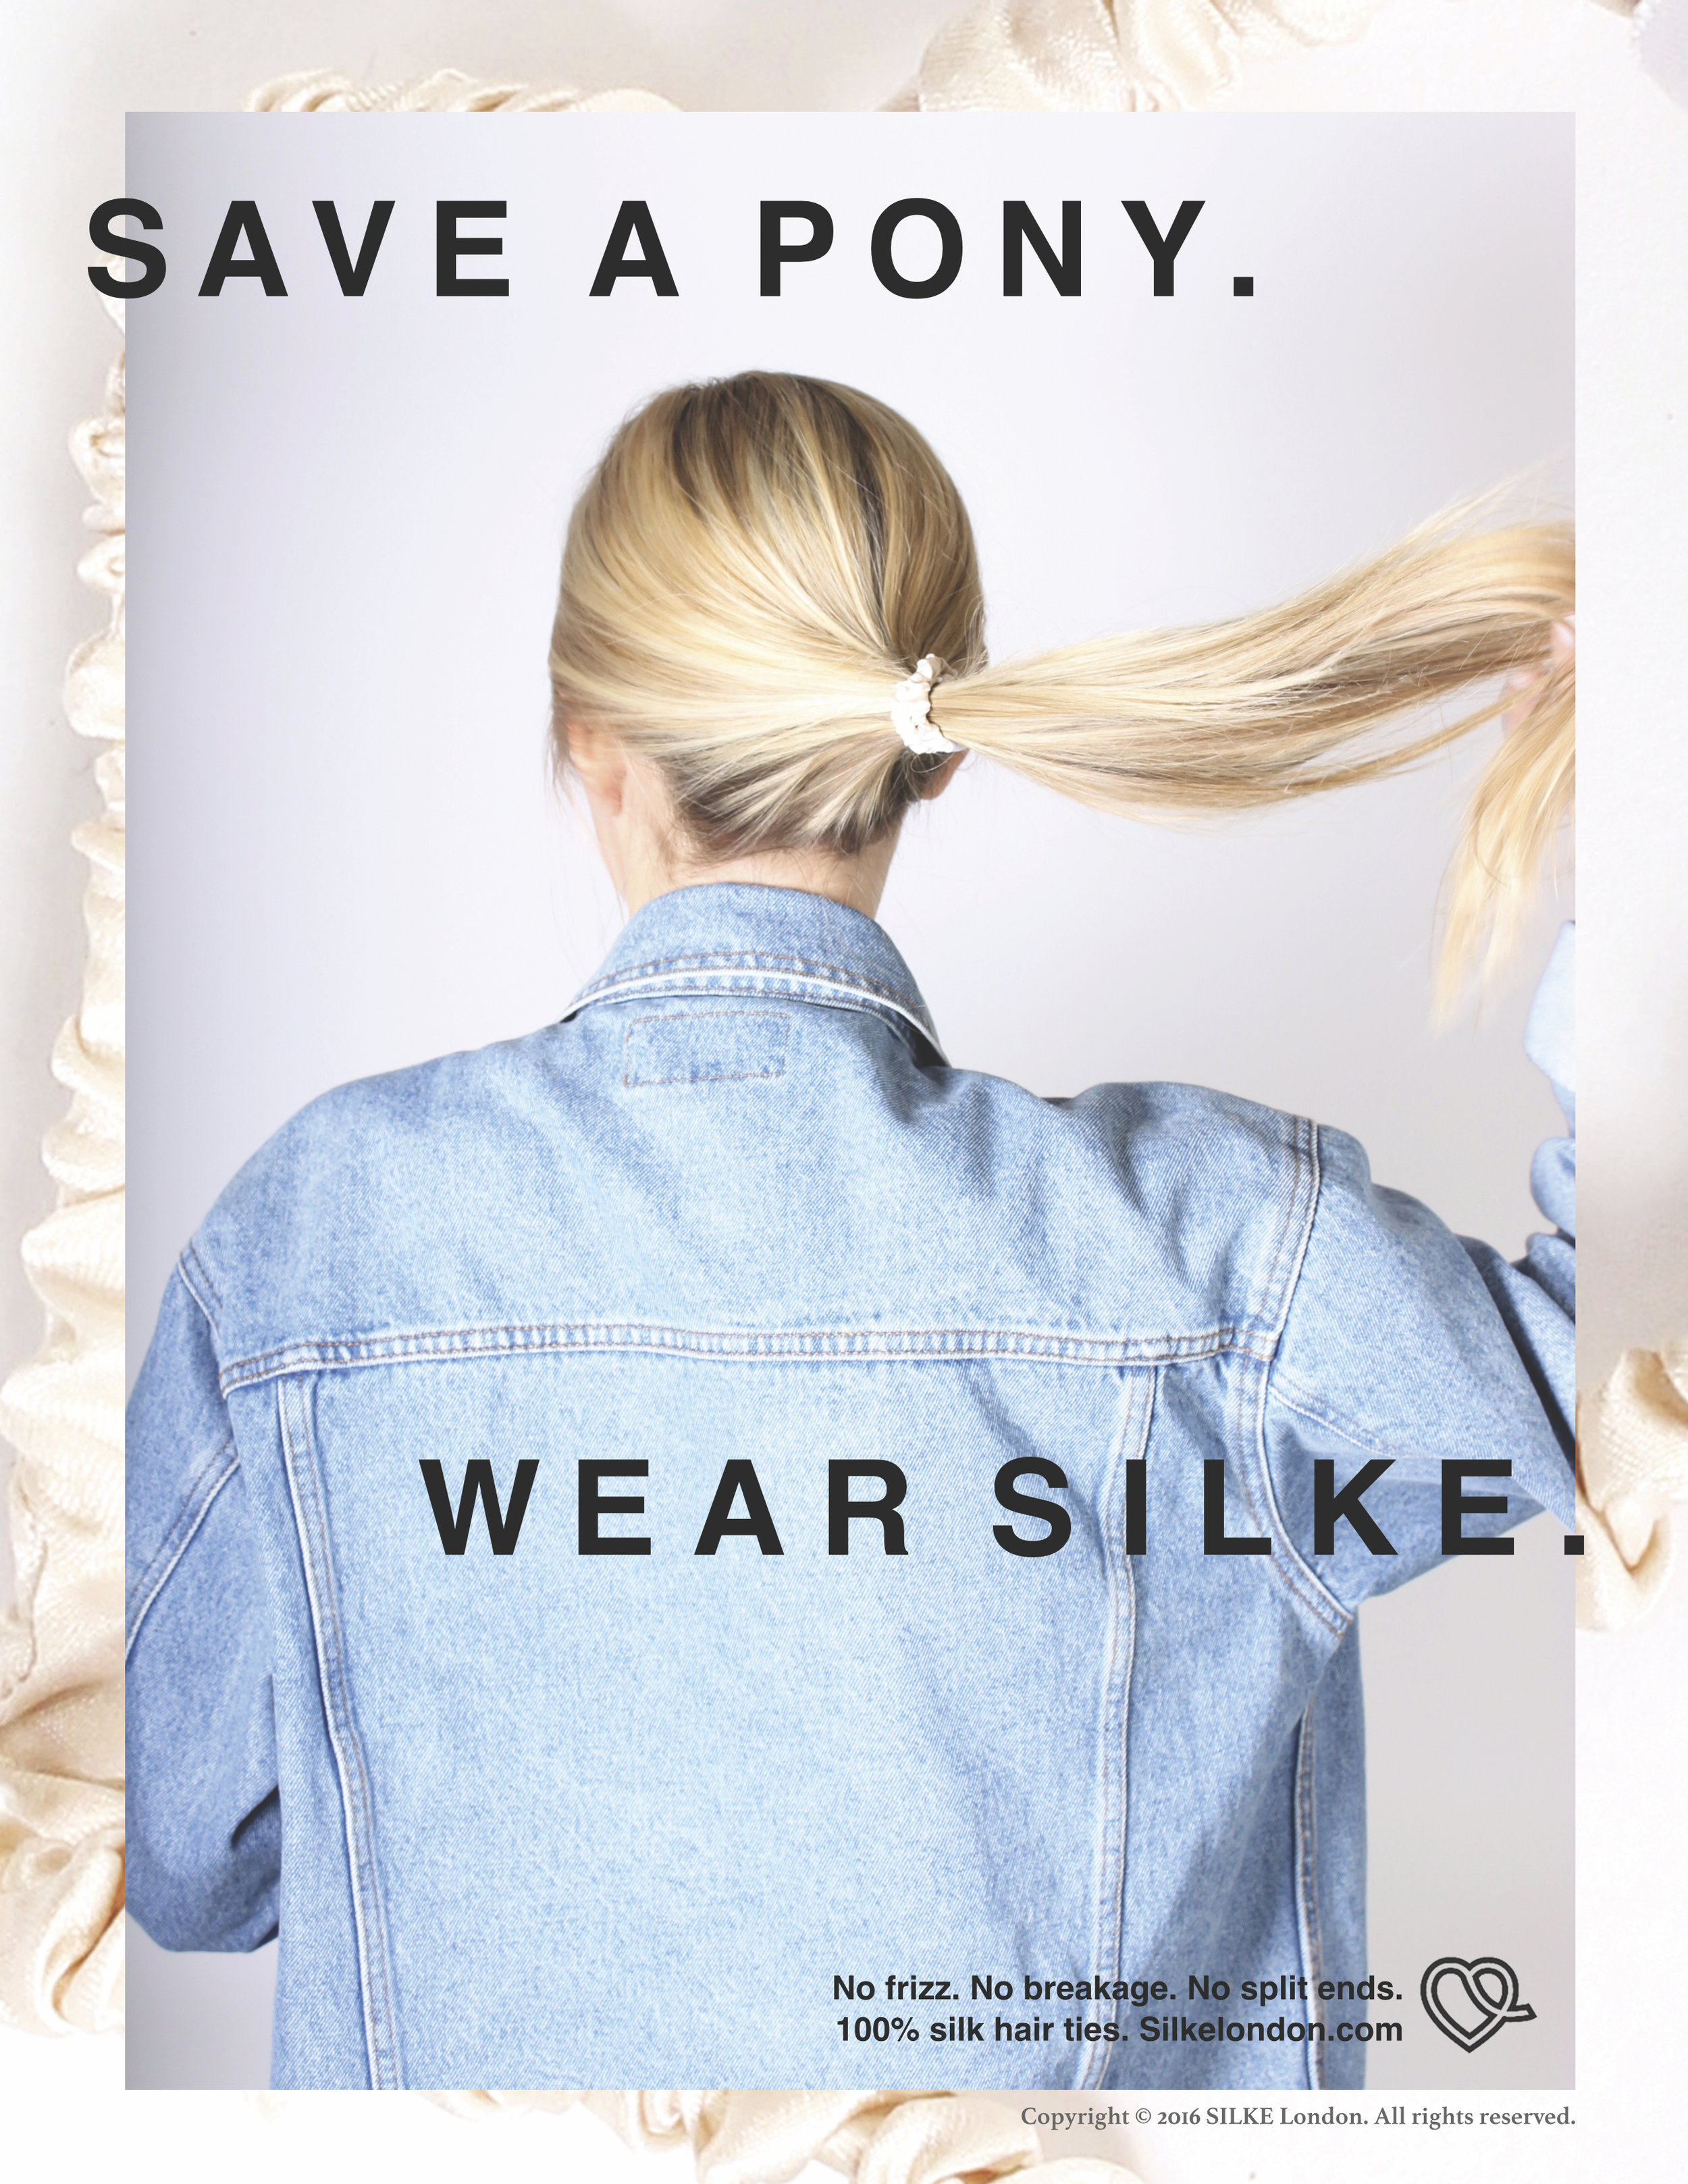 Silke Ad 1 copy.jpg